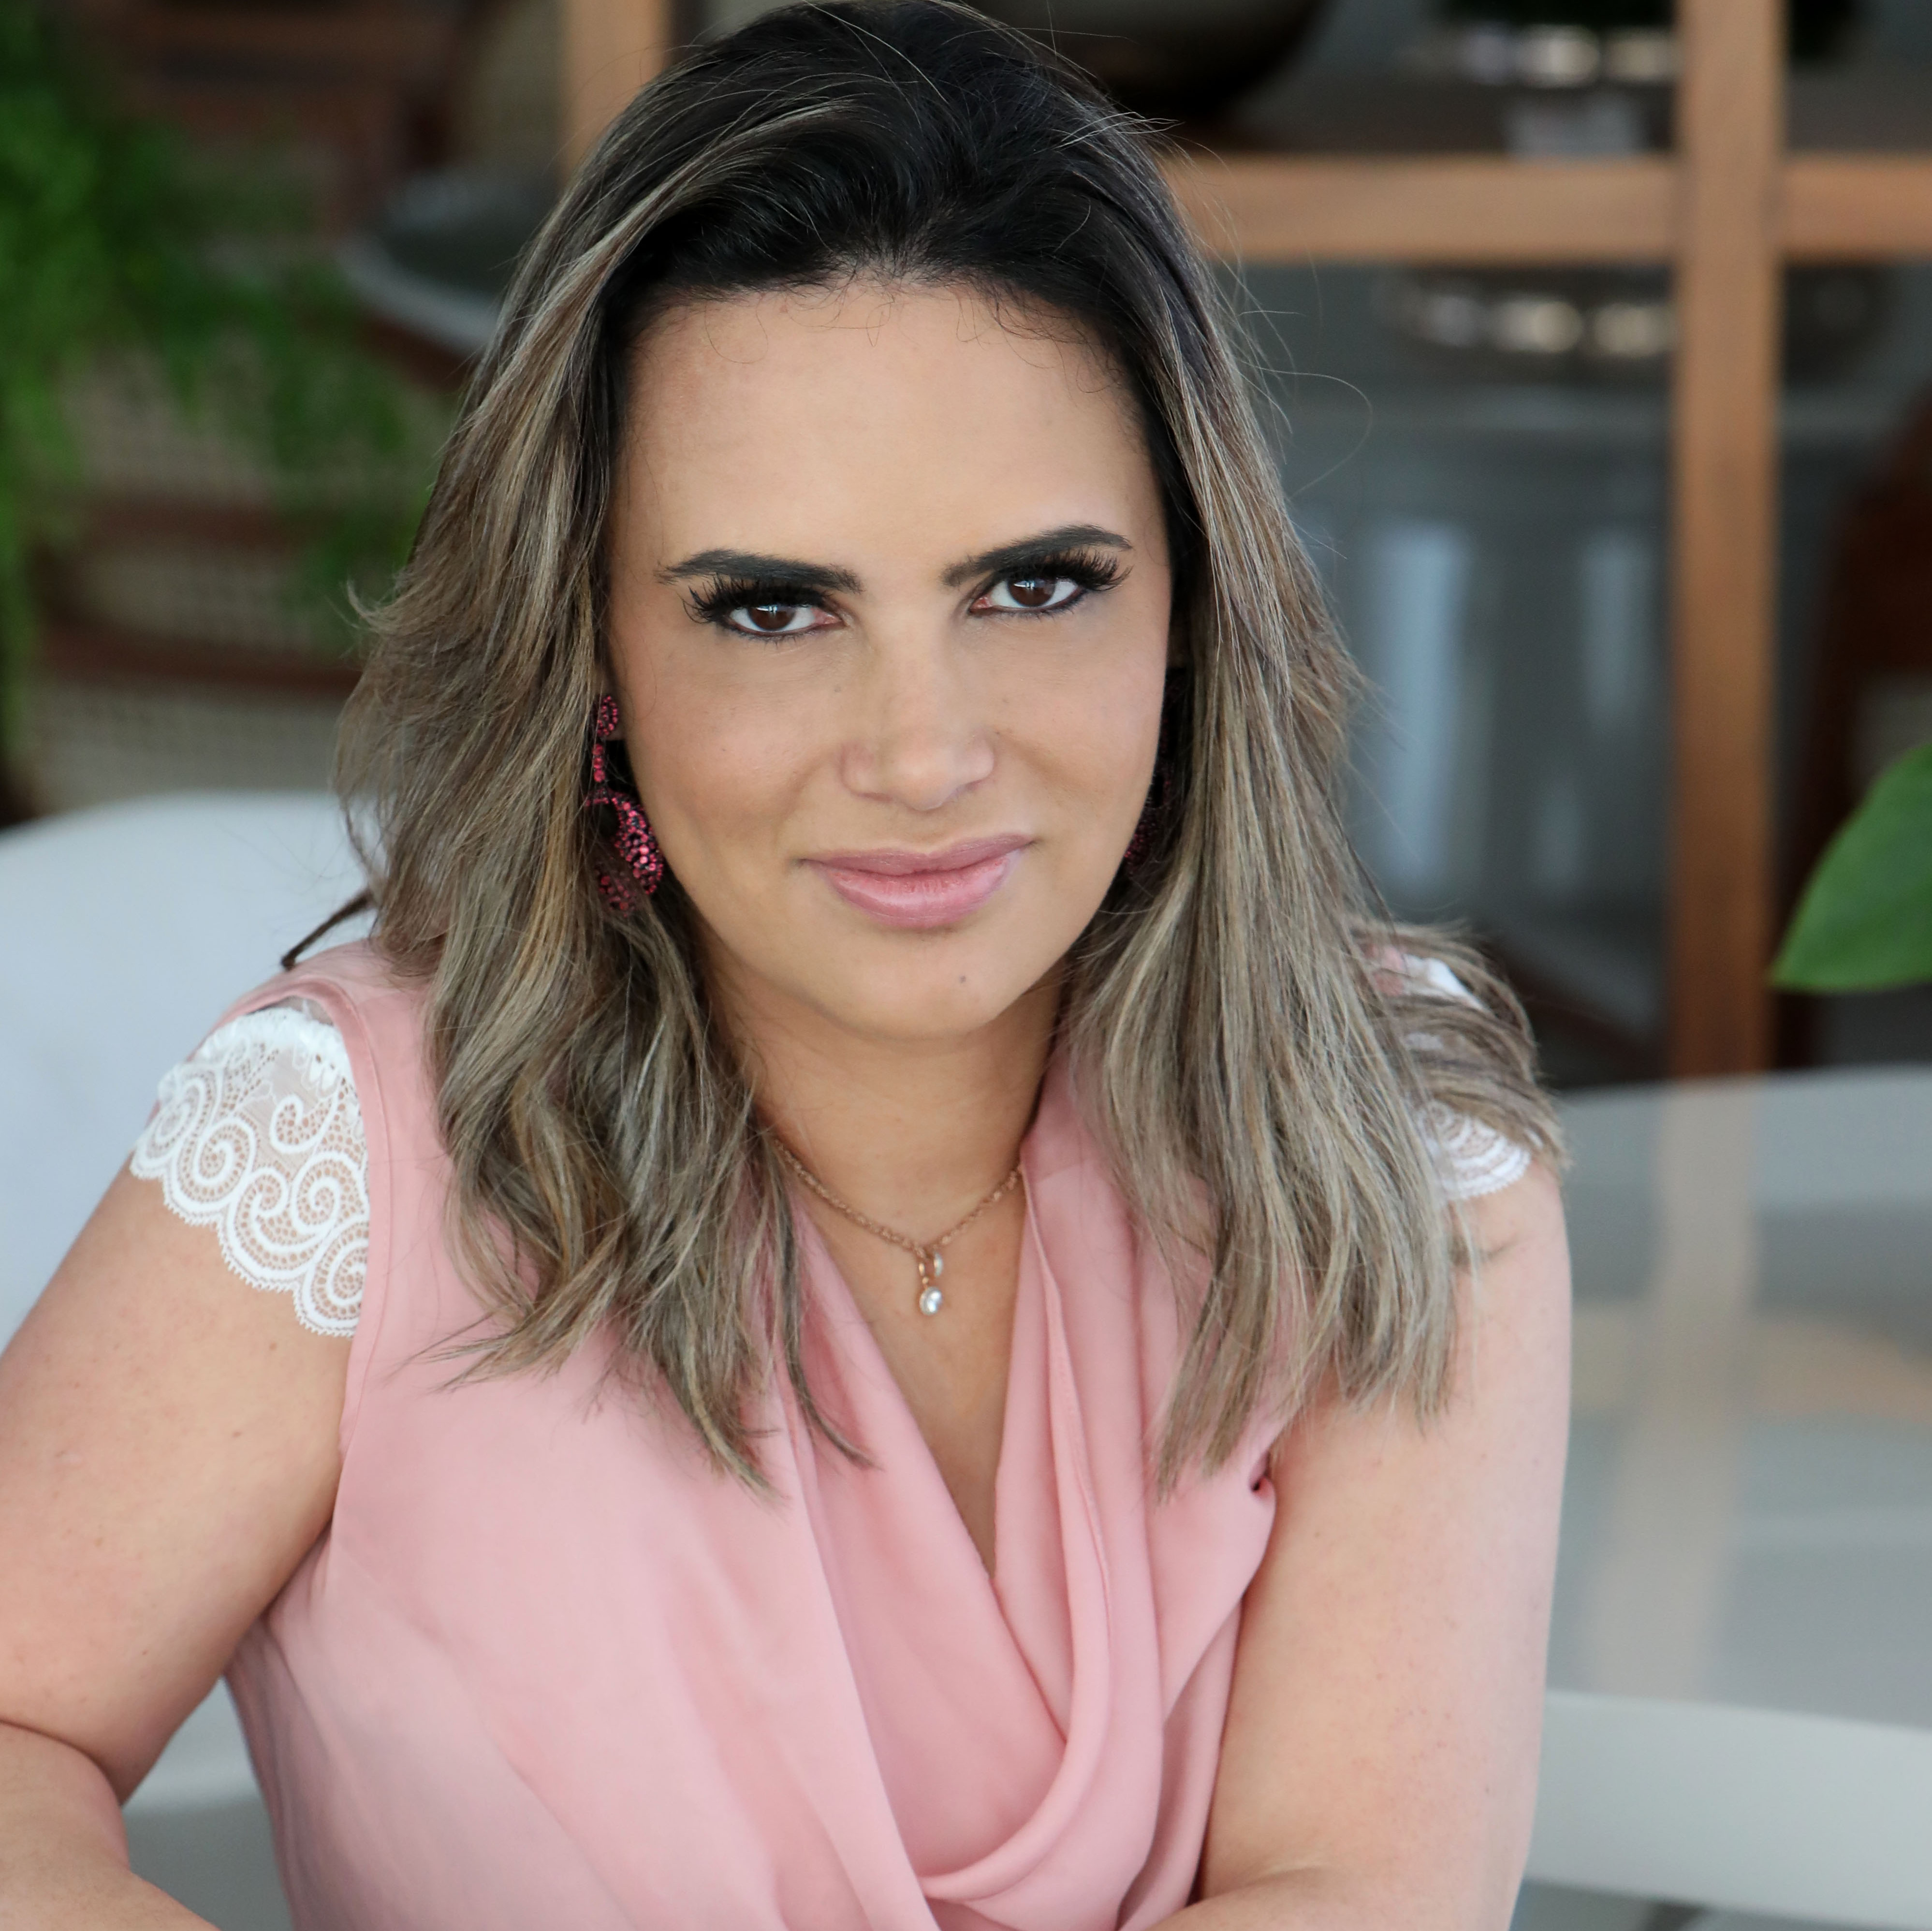 Ana Carolina Lucio Pereira